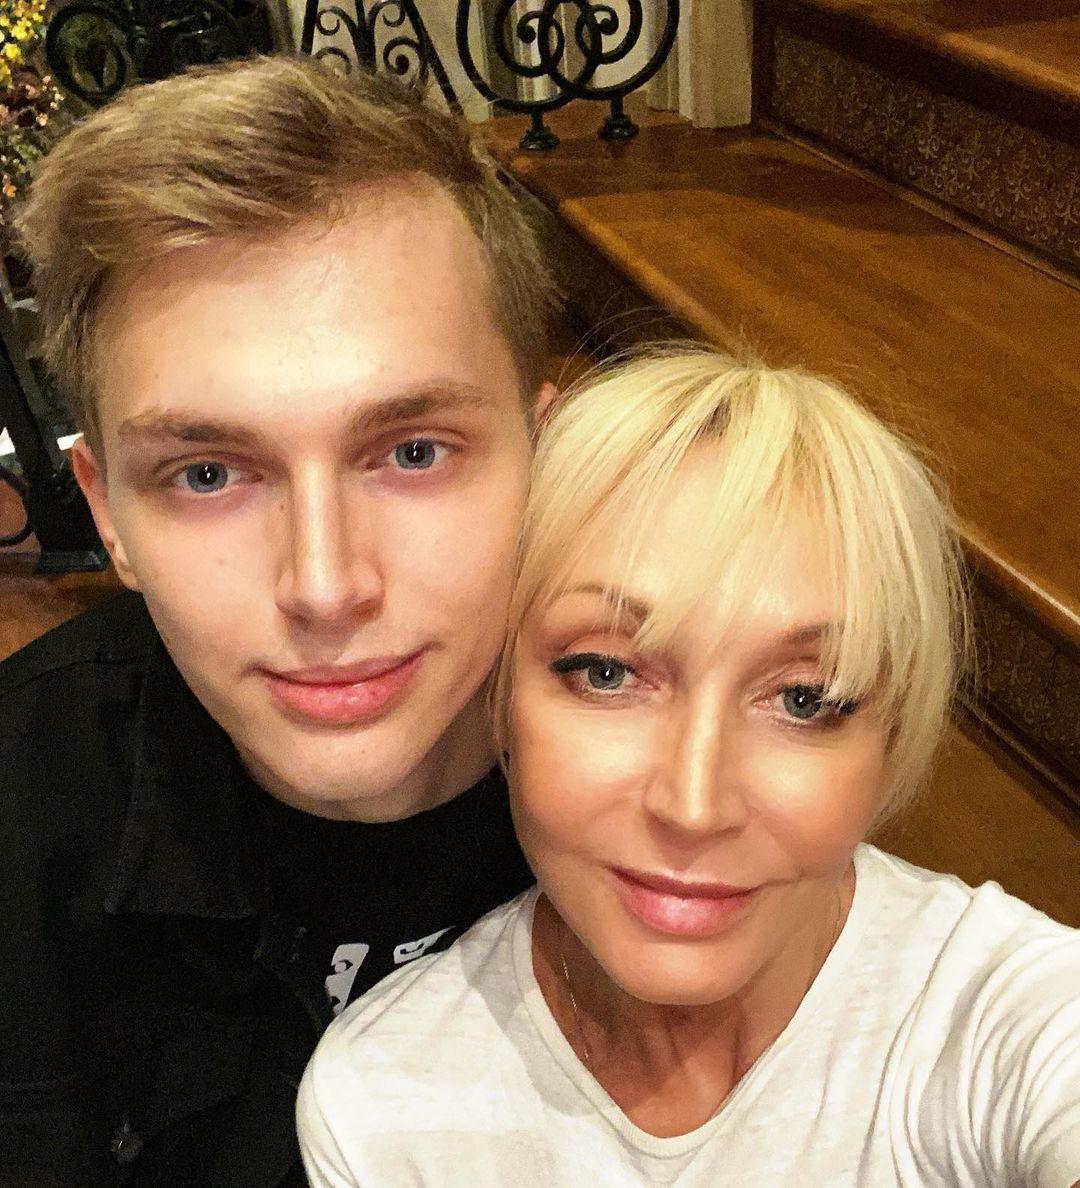 Младший сын Кристины Орбакайте окончил магистратуру